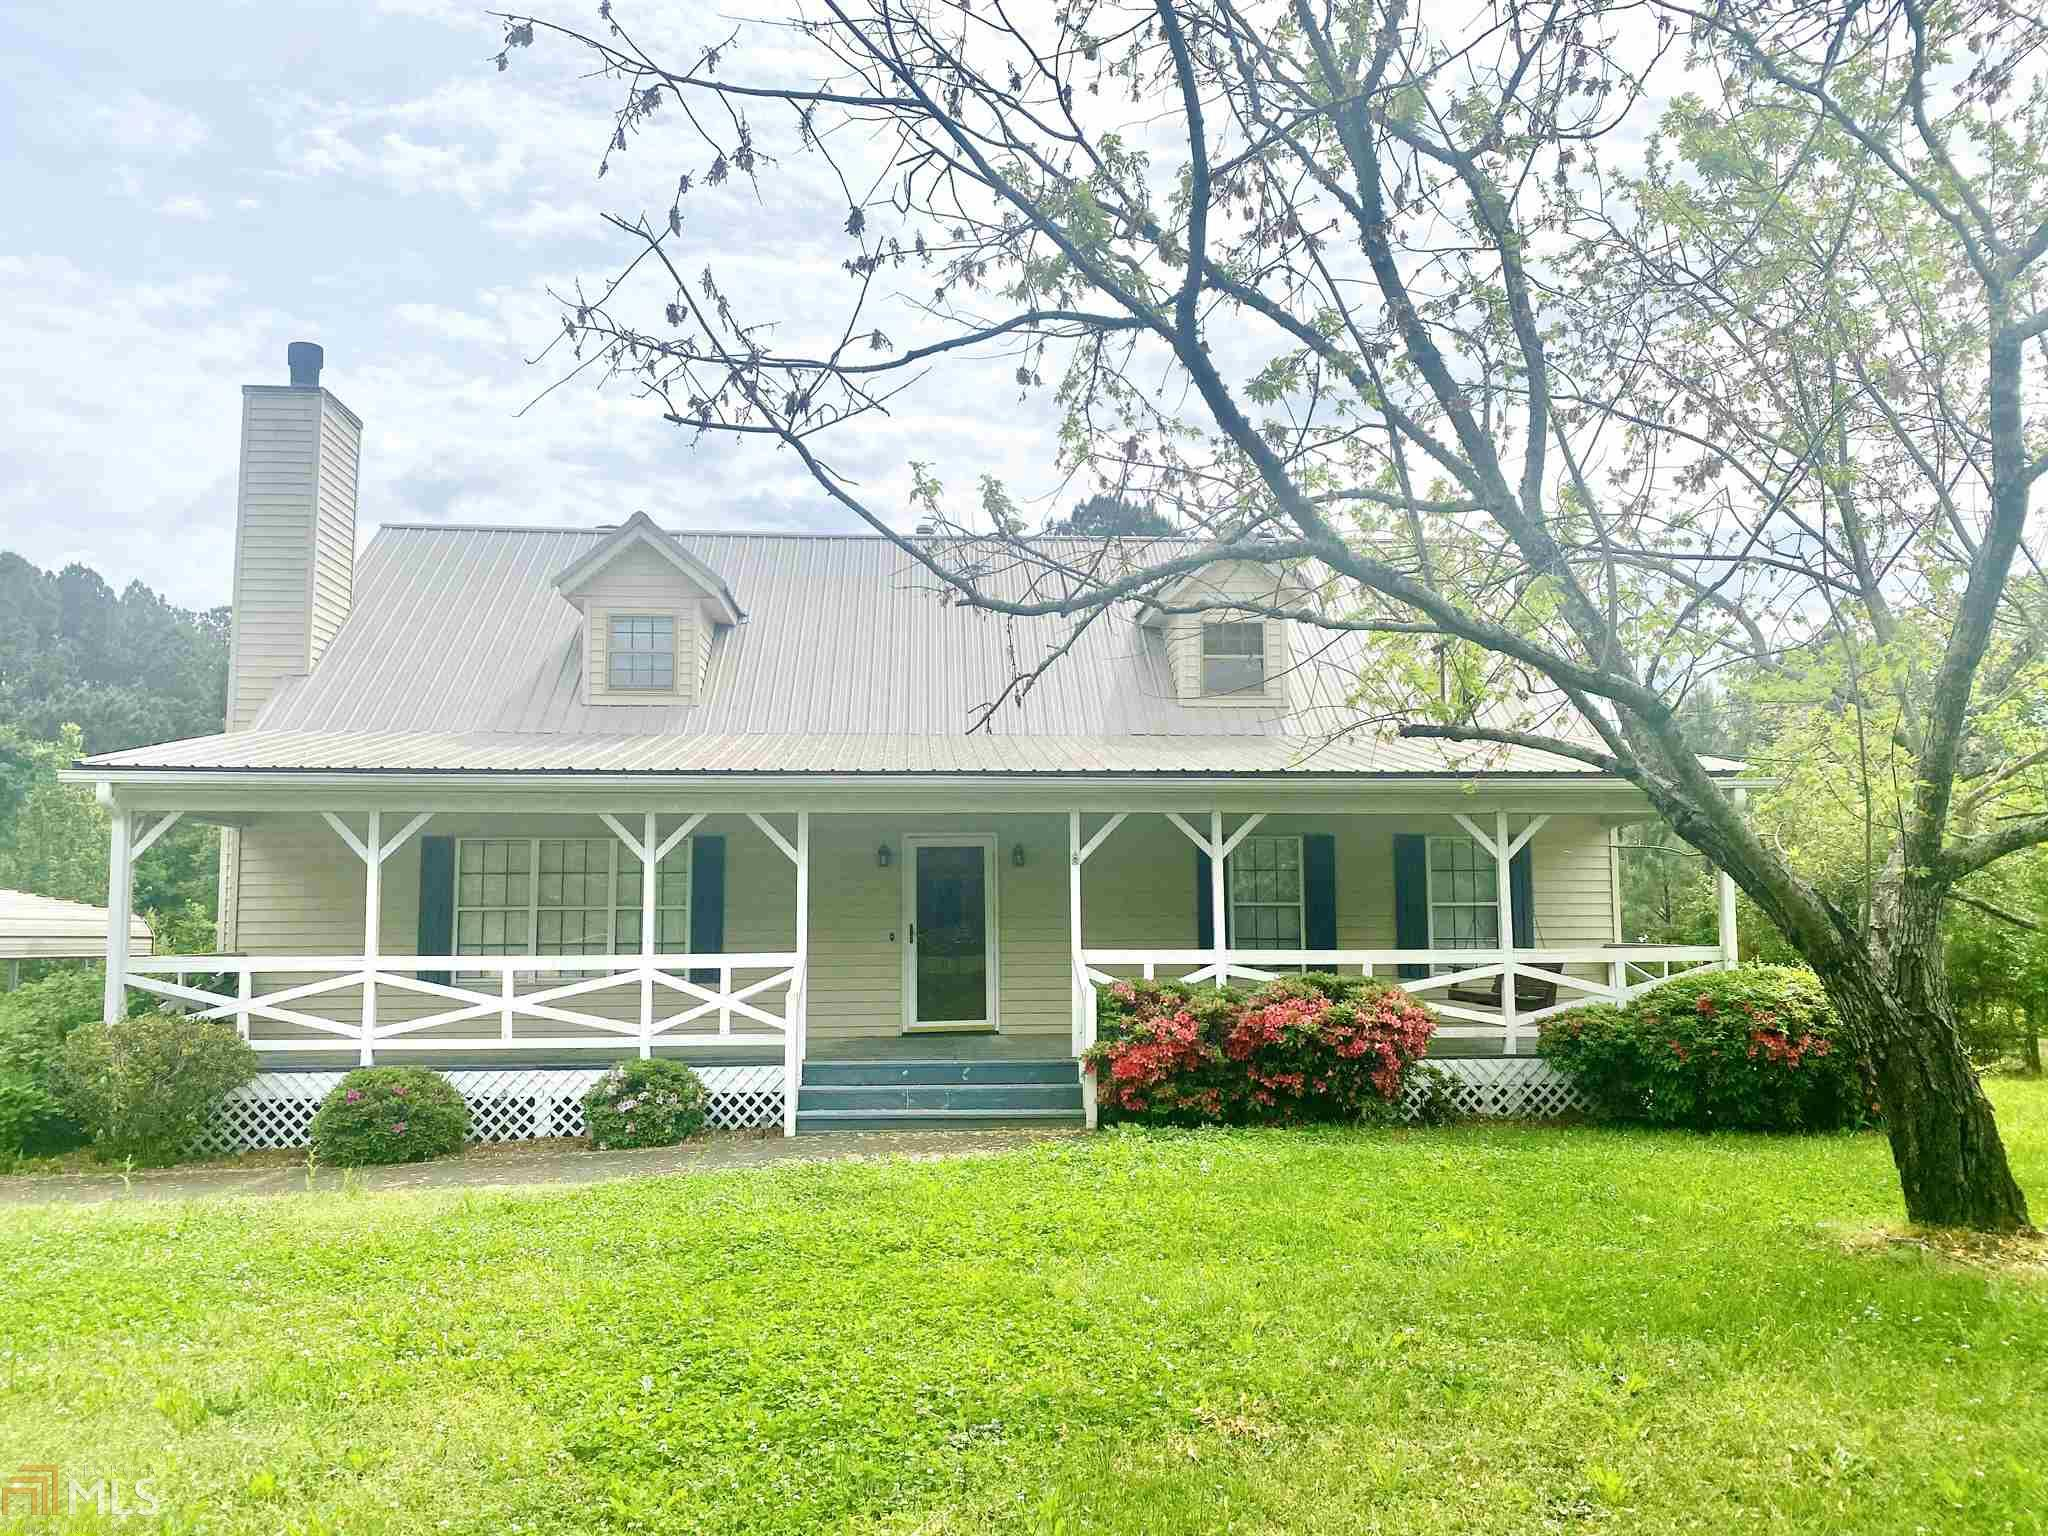 85 Antioch Rd, McDonough, Georgia 30252, 5 Bedrooms Bedrooms, ,3 BathroomsBathrooms,Single Family,For Sale,85 Antioch Rd,2,8961876